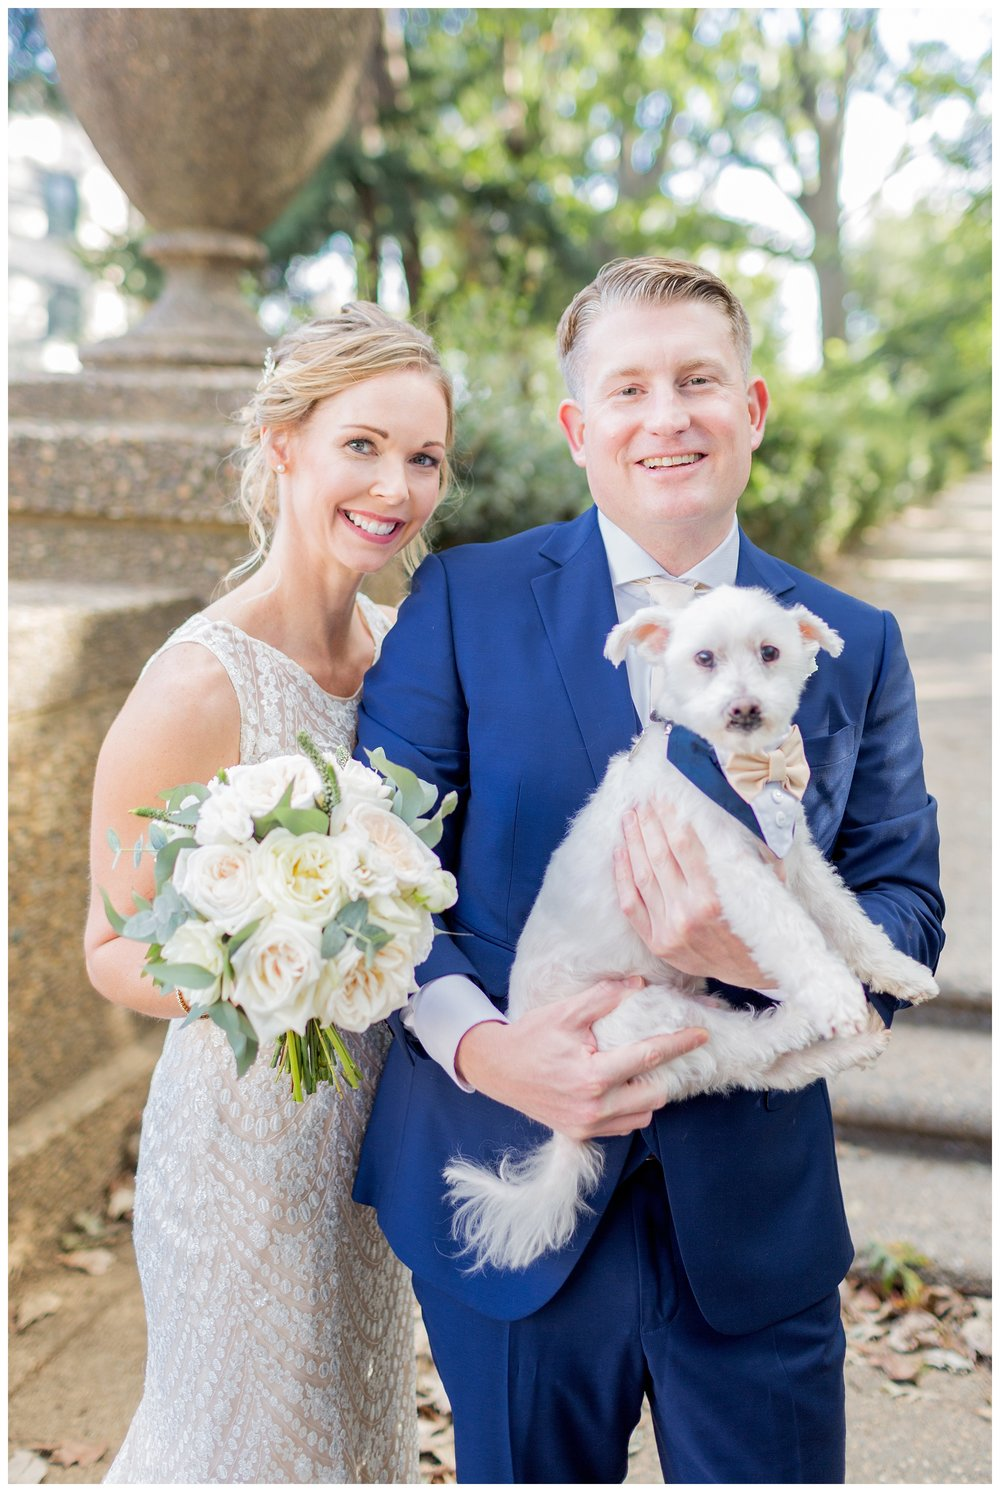 Meridian Hill Park Wedding | Washington DC Wedding Photographer Kir Tuben_0029.jpg